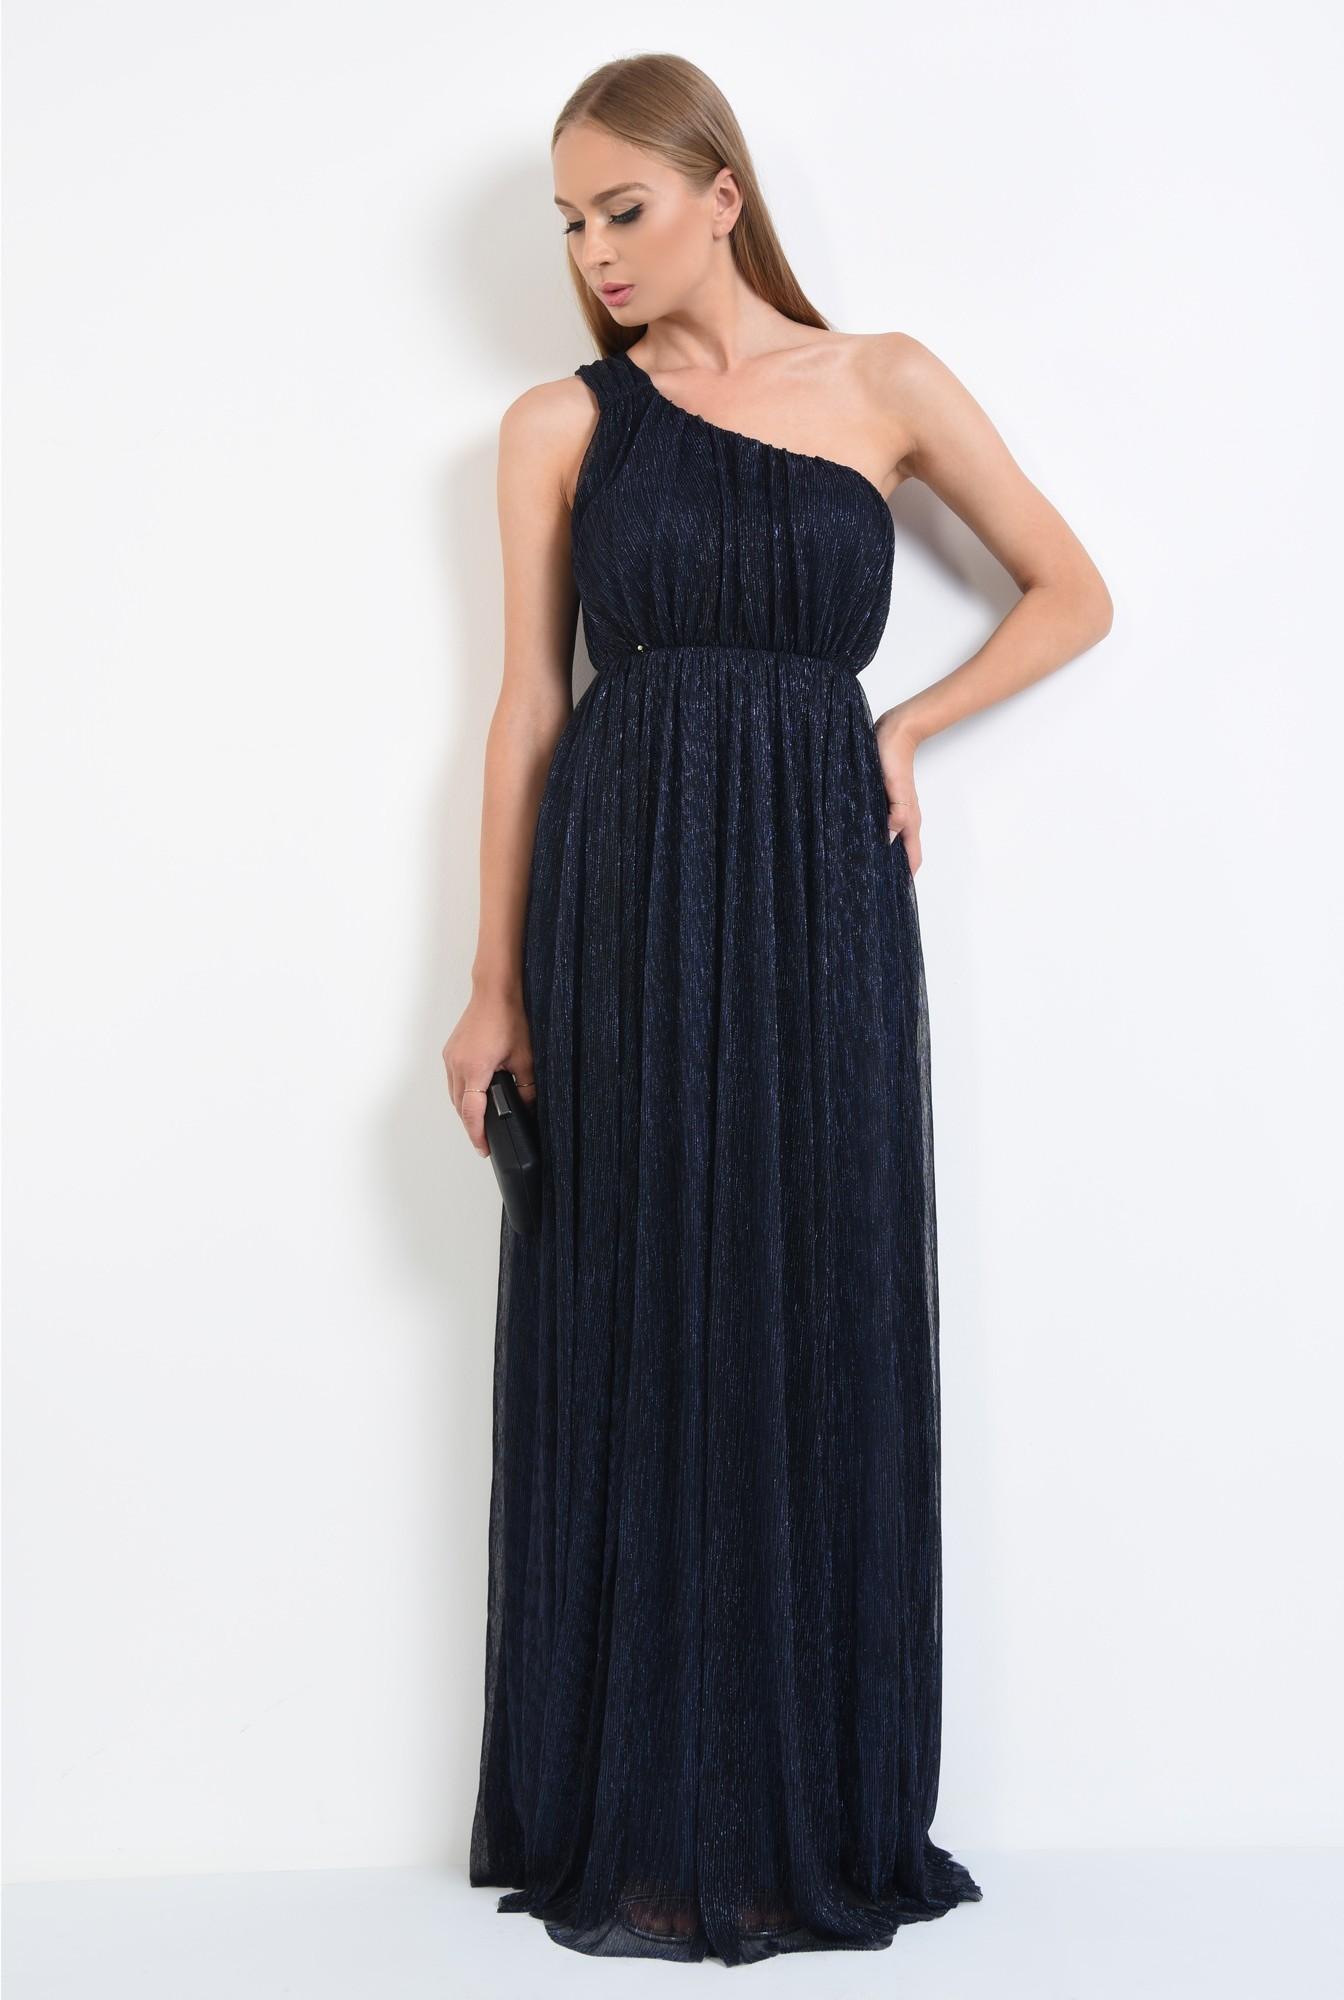 3 - rochie de seara, lunga, lurex, bleumarin, umar gol